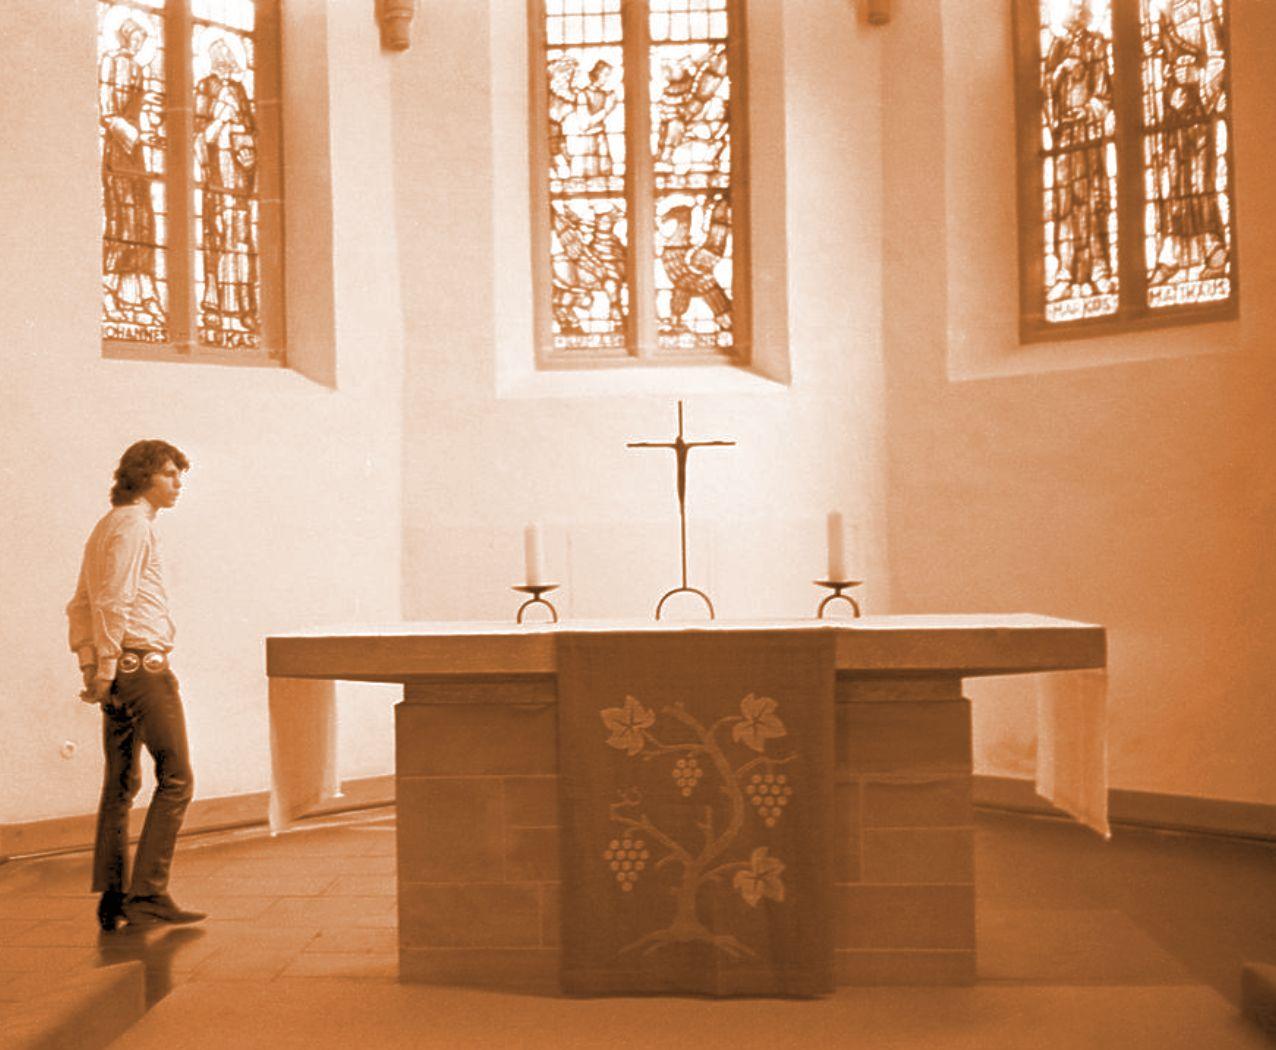 http://hiphappy.files.wordpress.com/2009/08/new-jim-inside-a-church.jpg